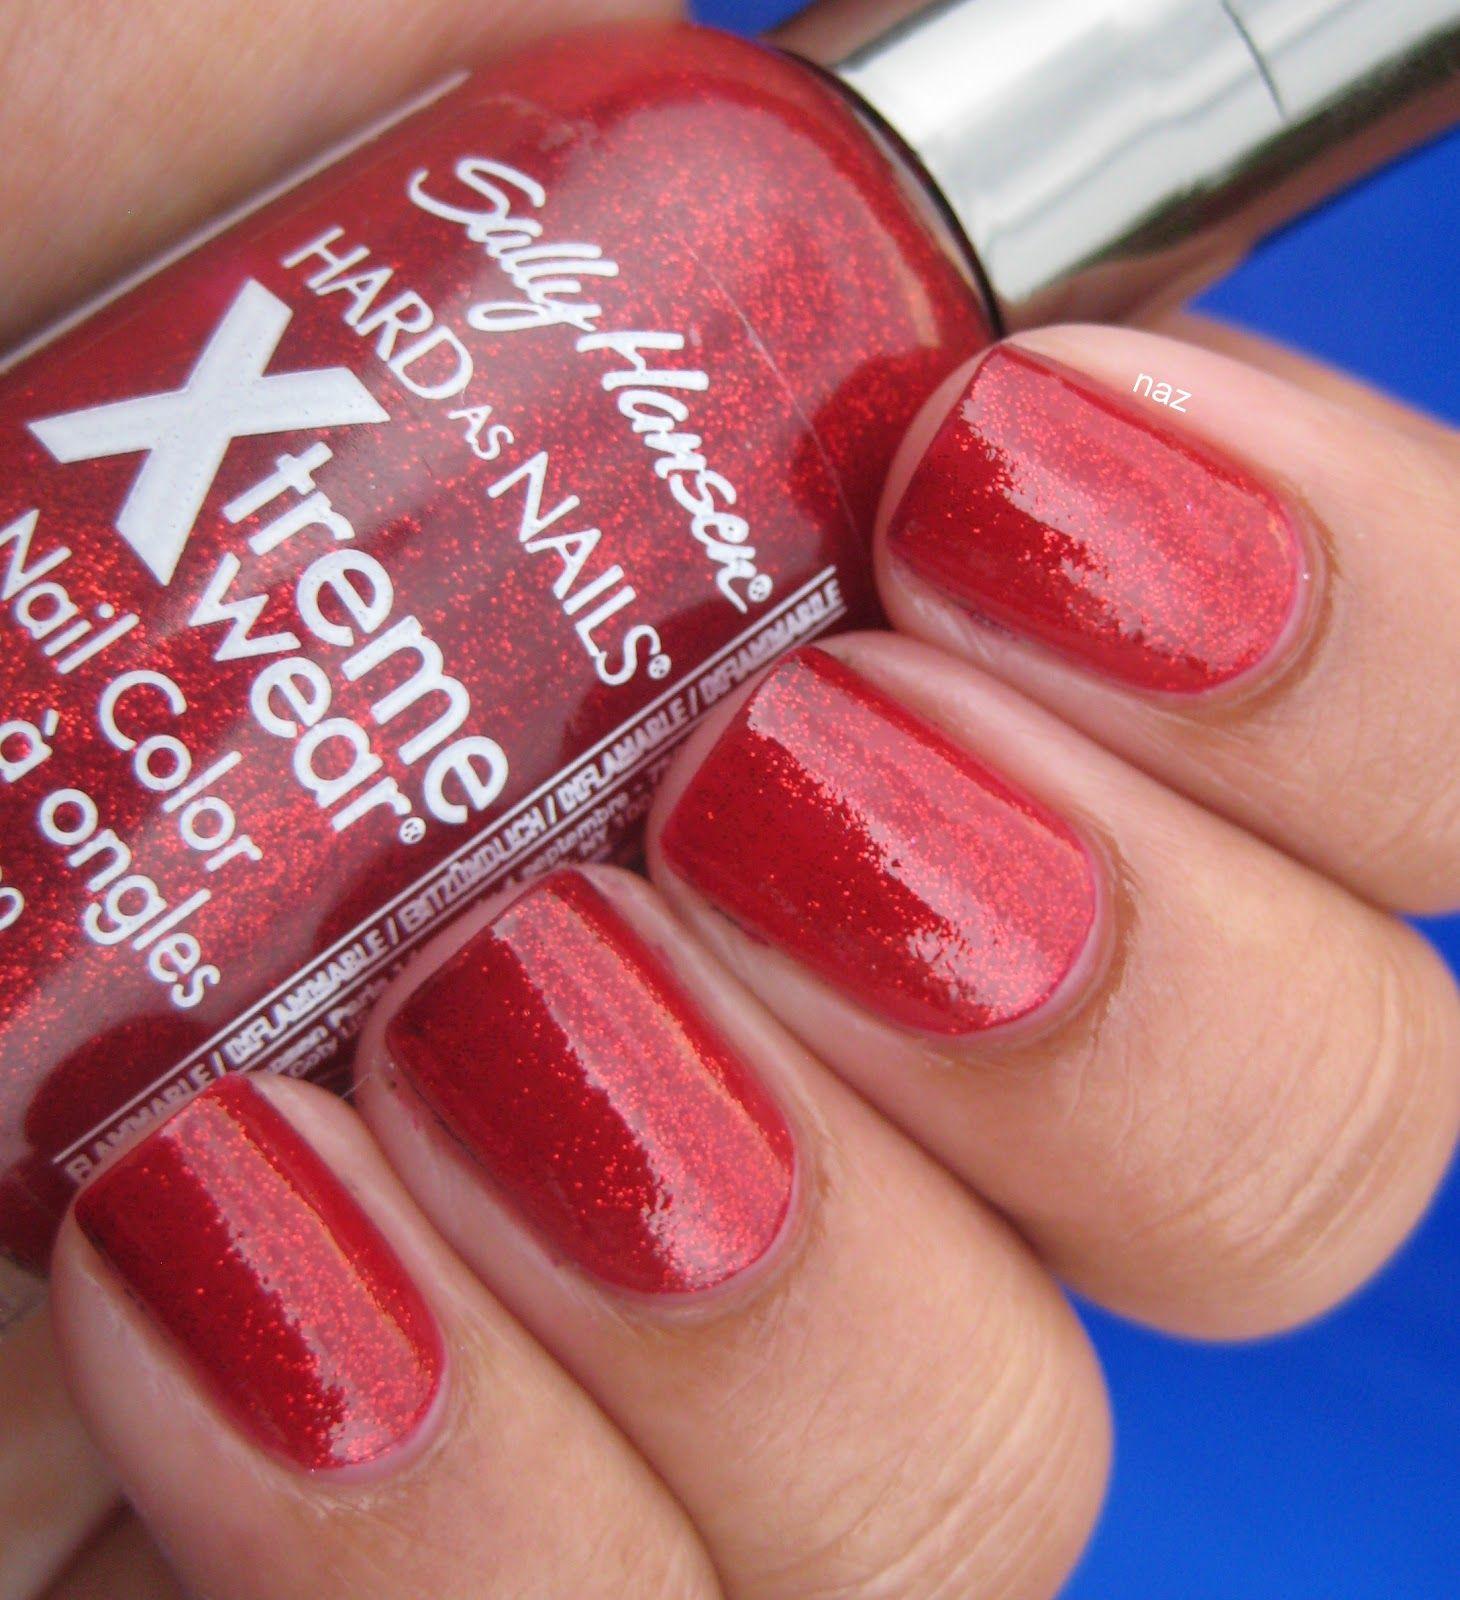 Sally Hansen Xtreme Wear 390 Red Carpet Nail colors